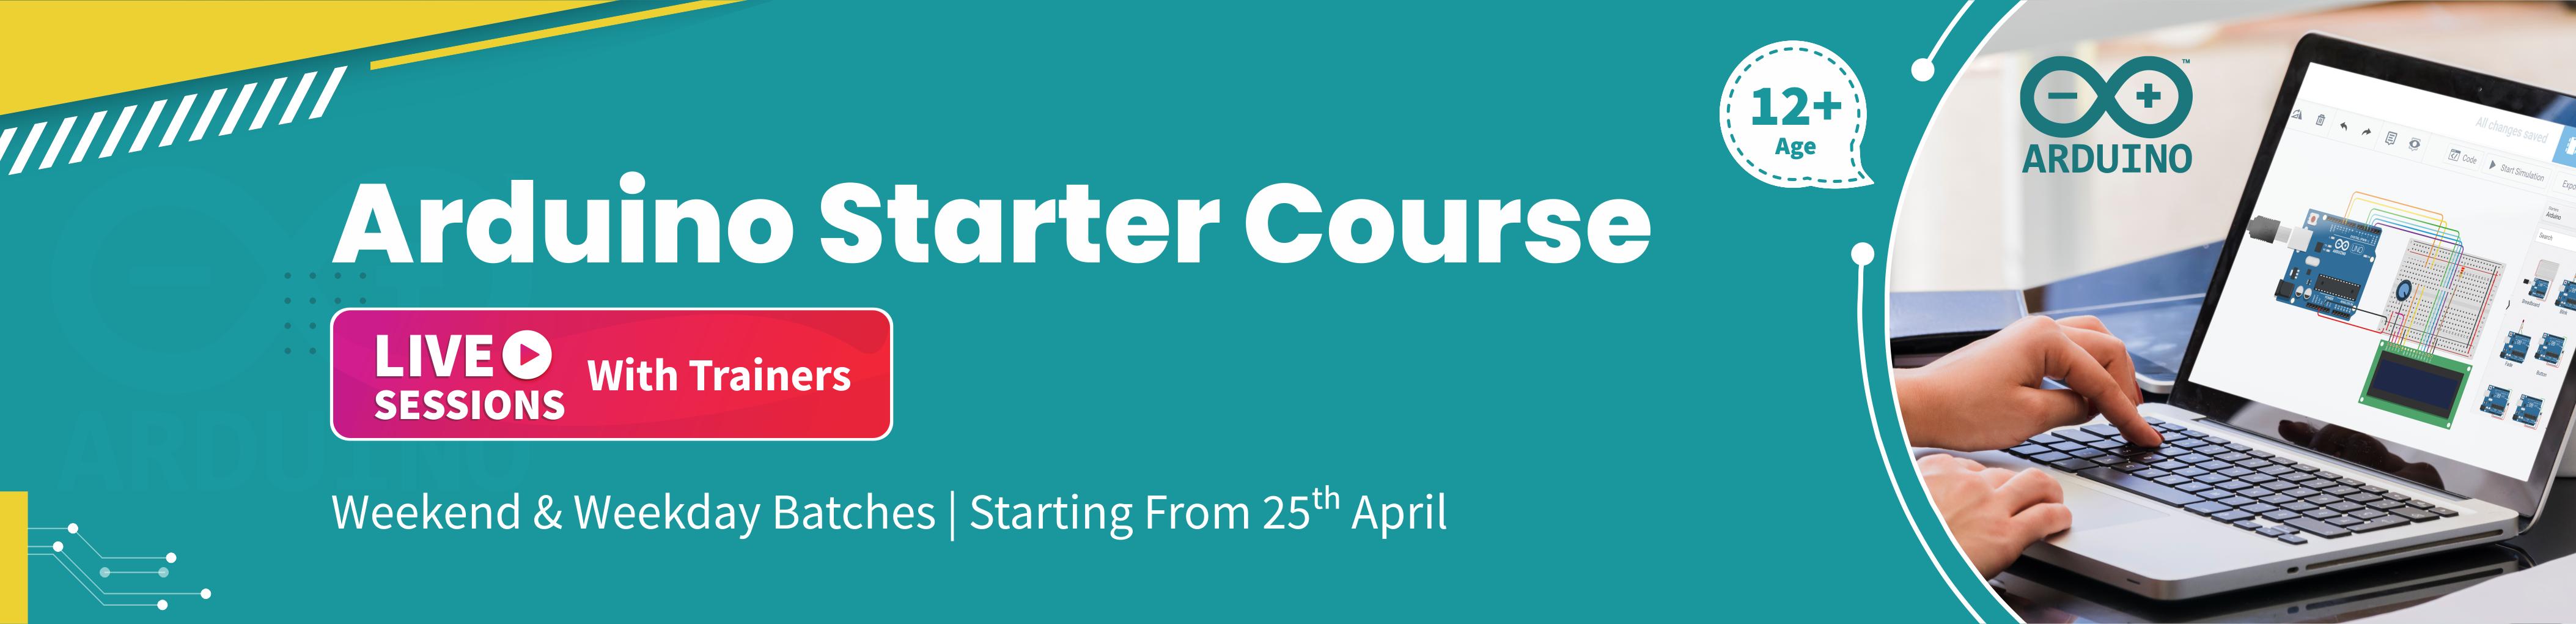 Arduino Starter Course banner